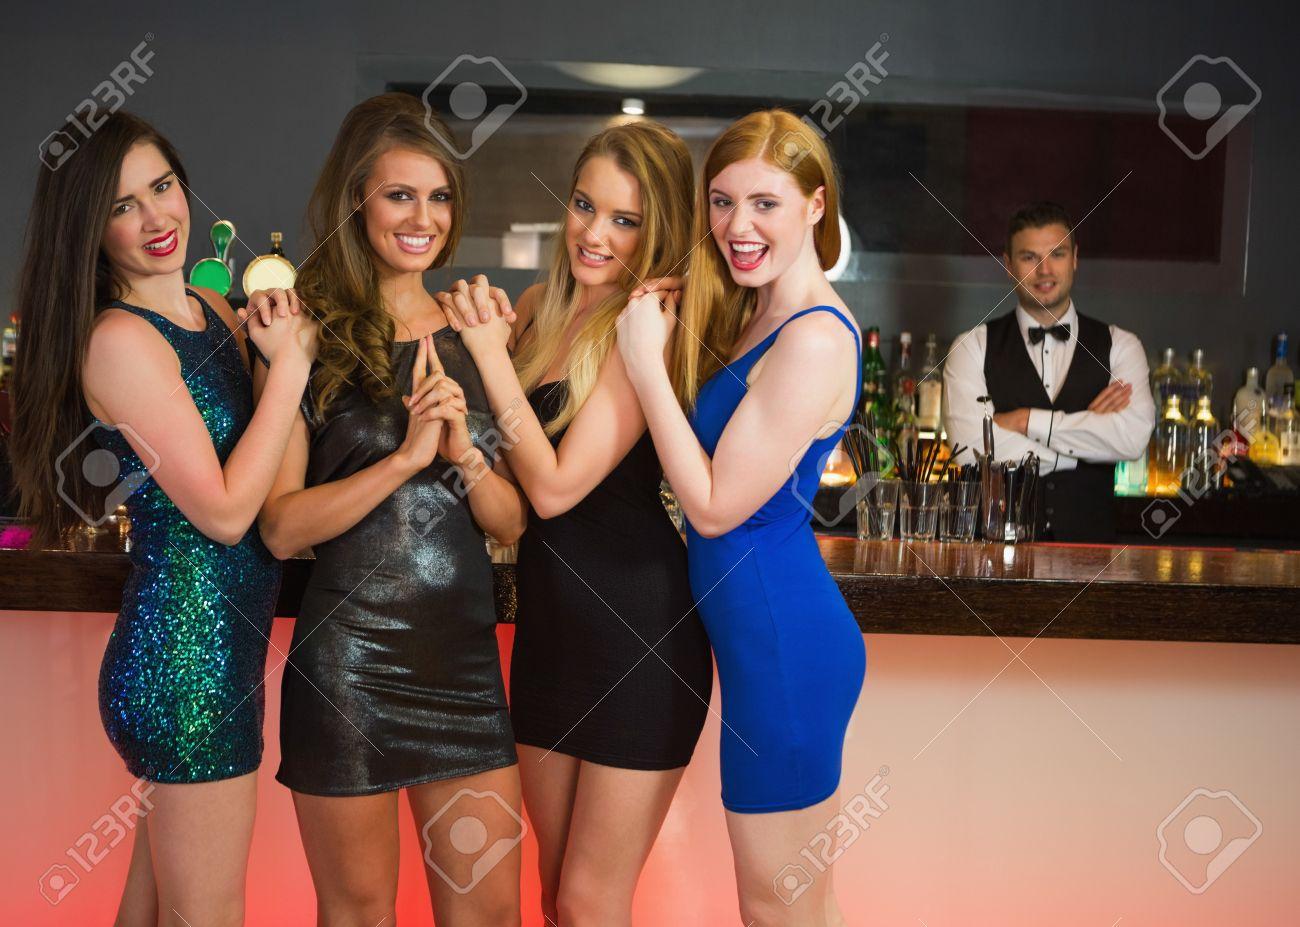 Sexy friends pics 4